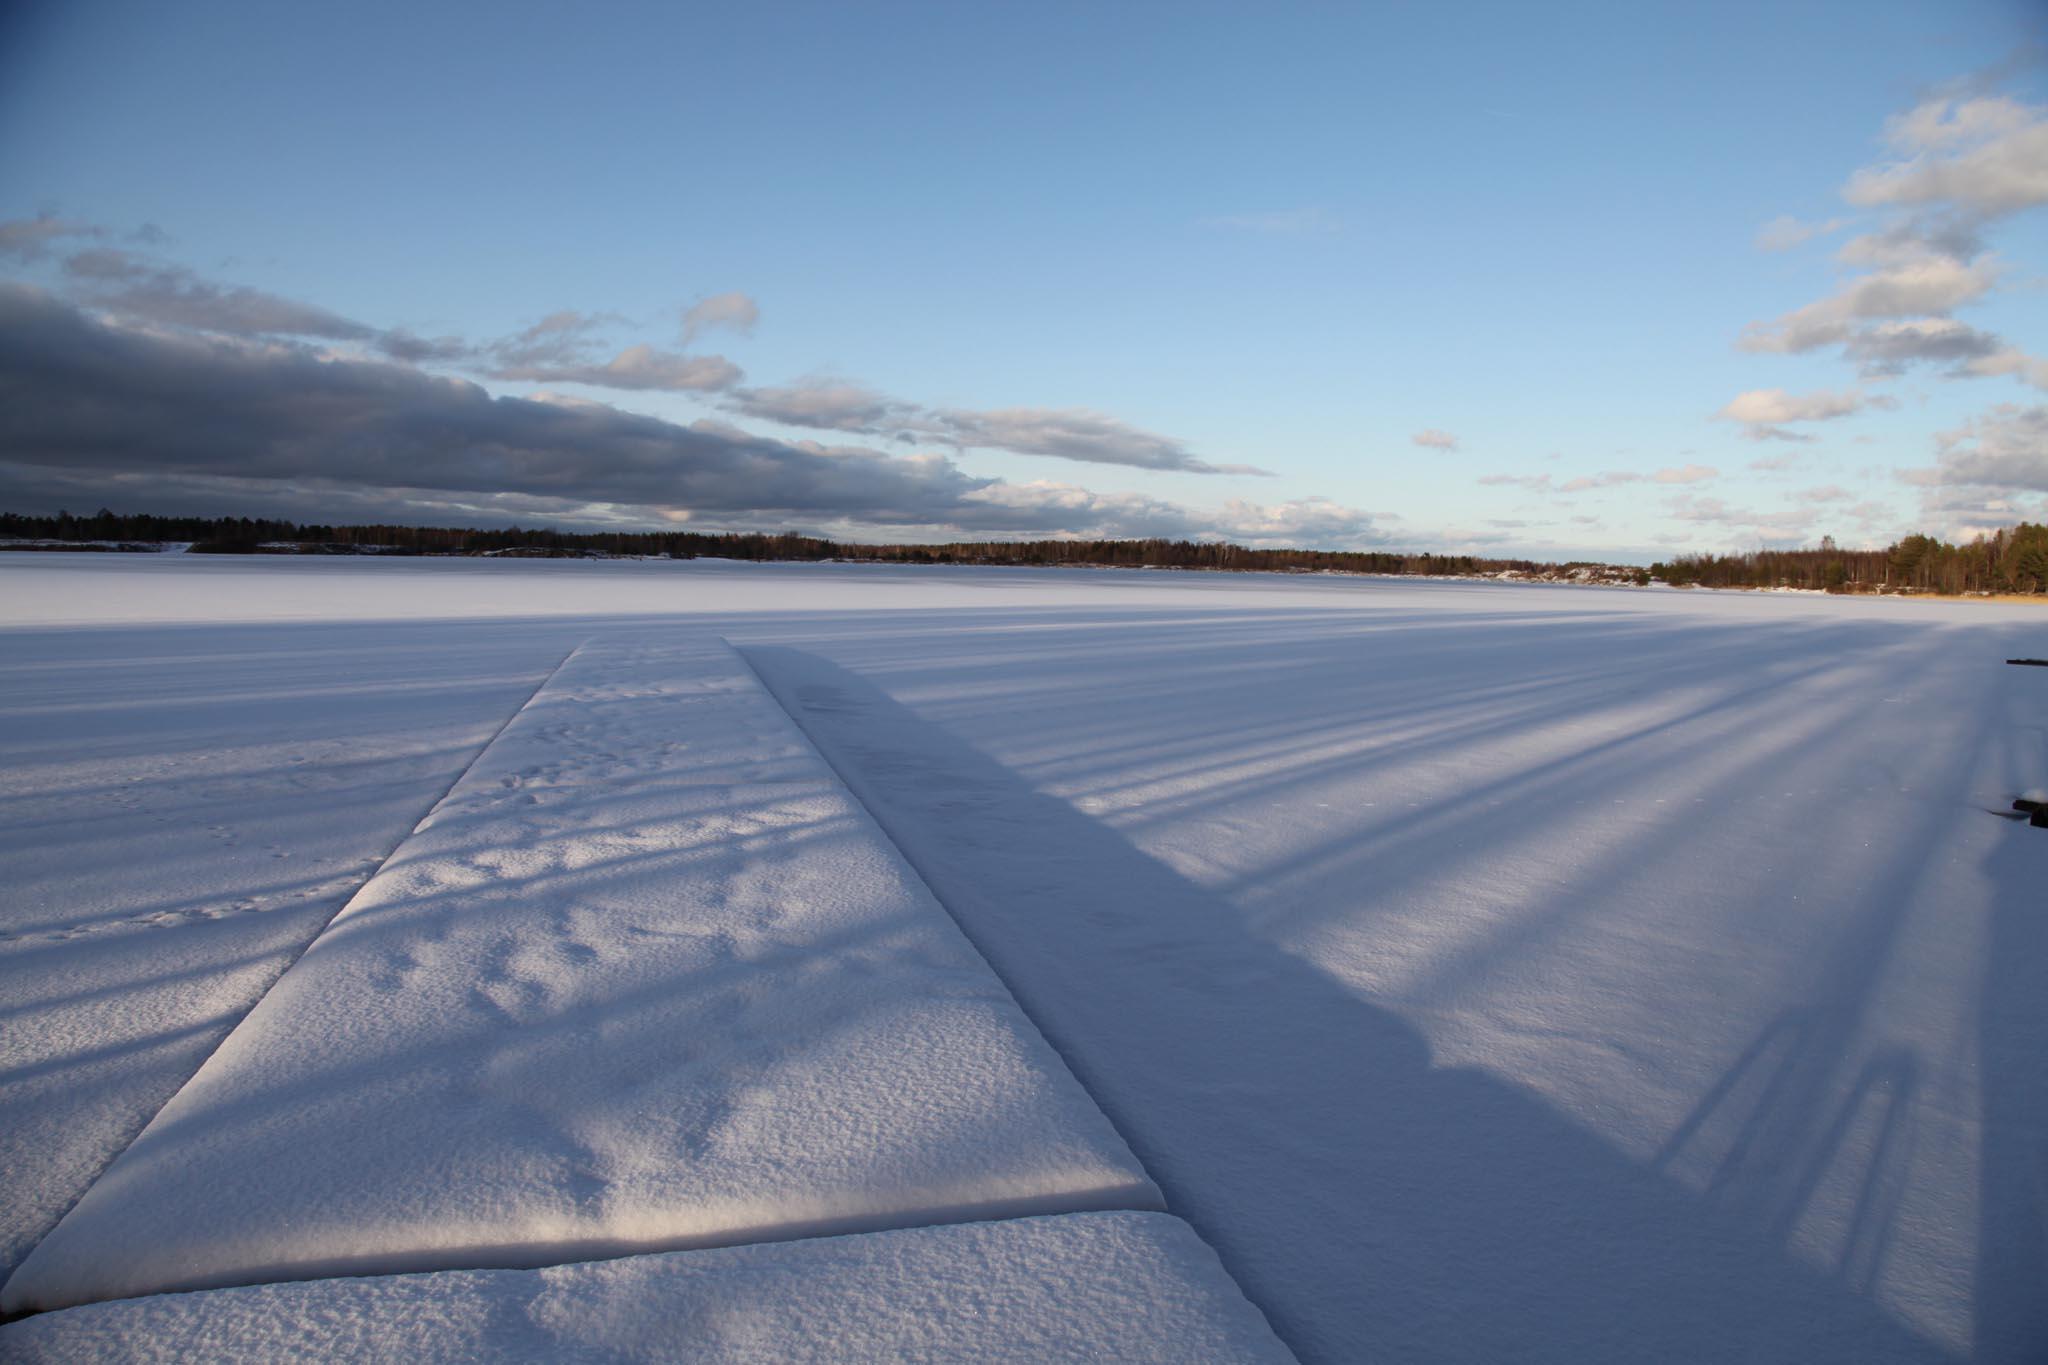 Frozen Lake, Estonia